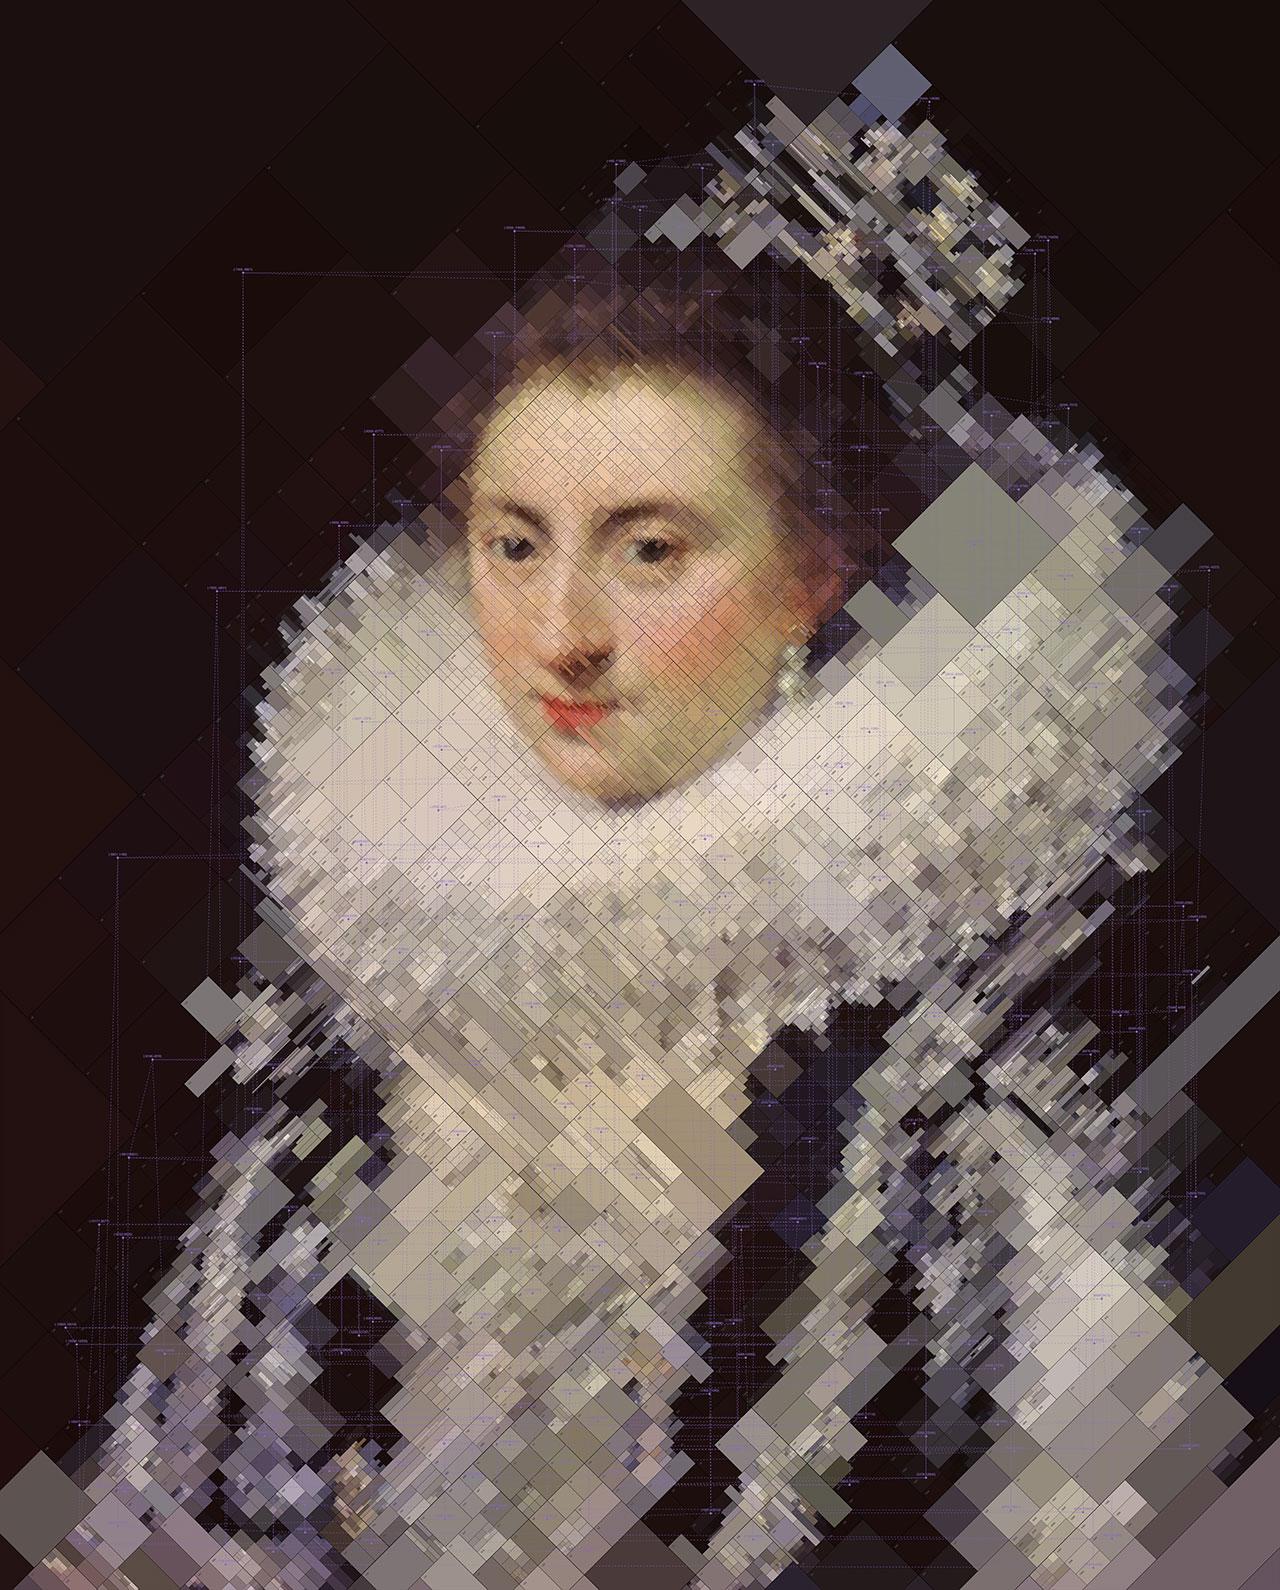 Portrait of Ernestine Yolande, from Portraits series by Dimitris Ladopoulos (Original paintingby Jan Anthonisz van Ravesteyn,1594-1663).